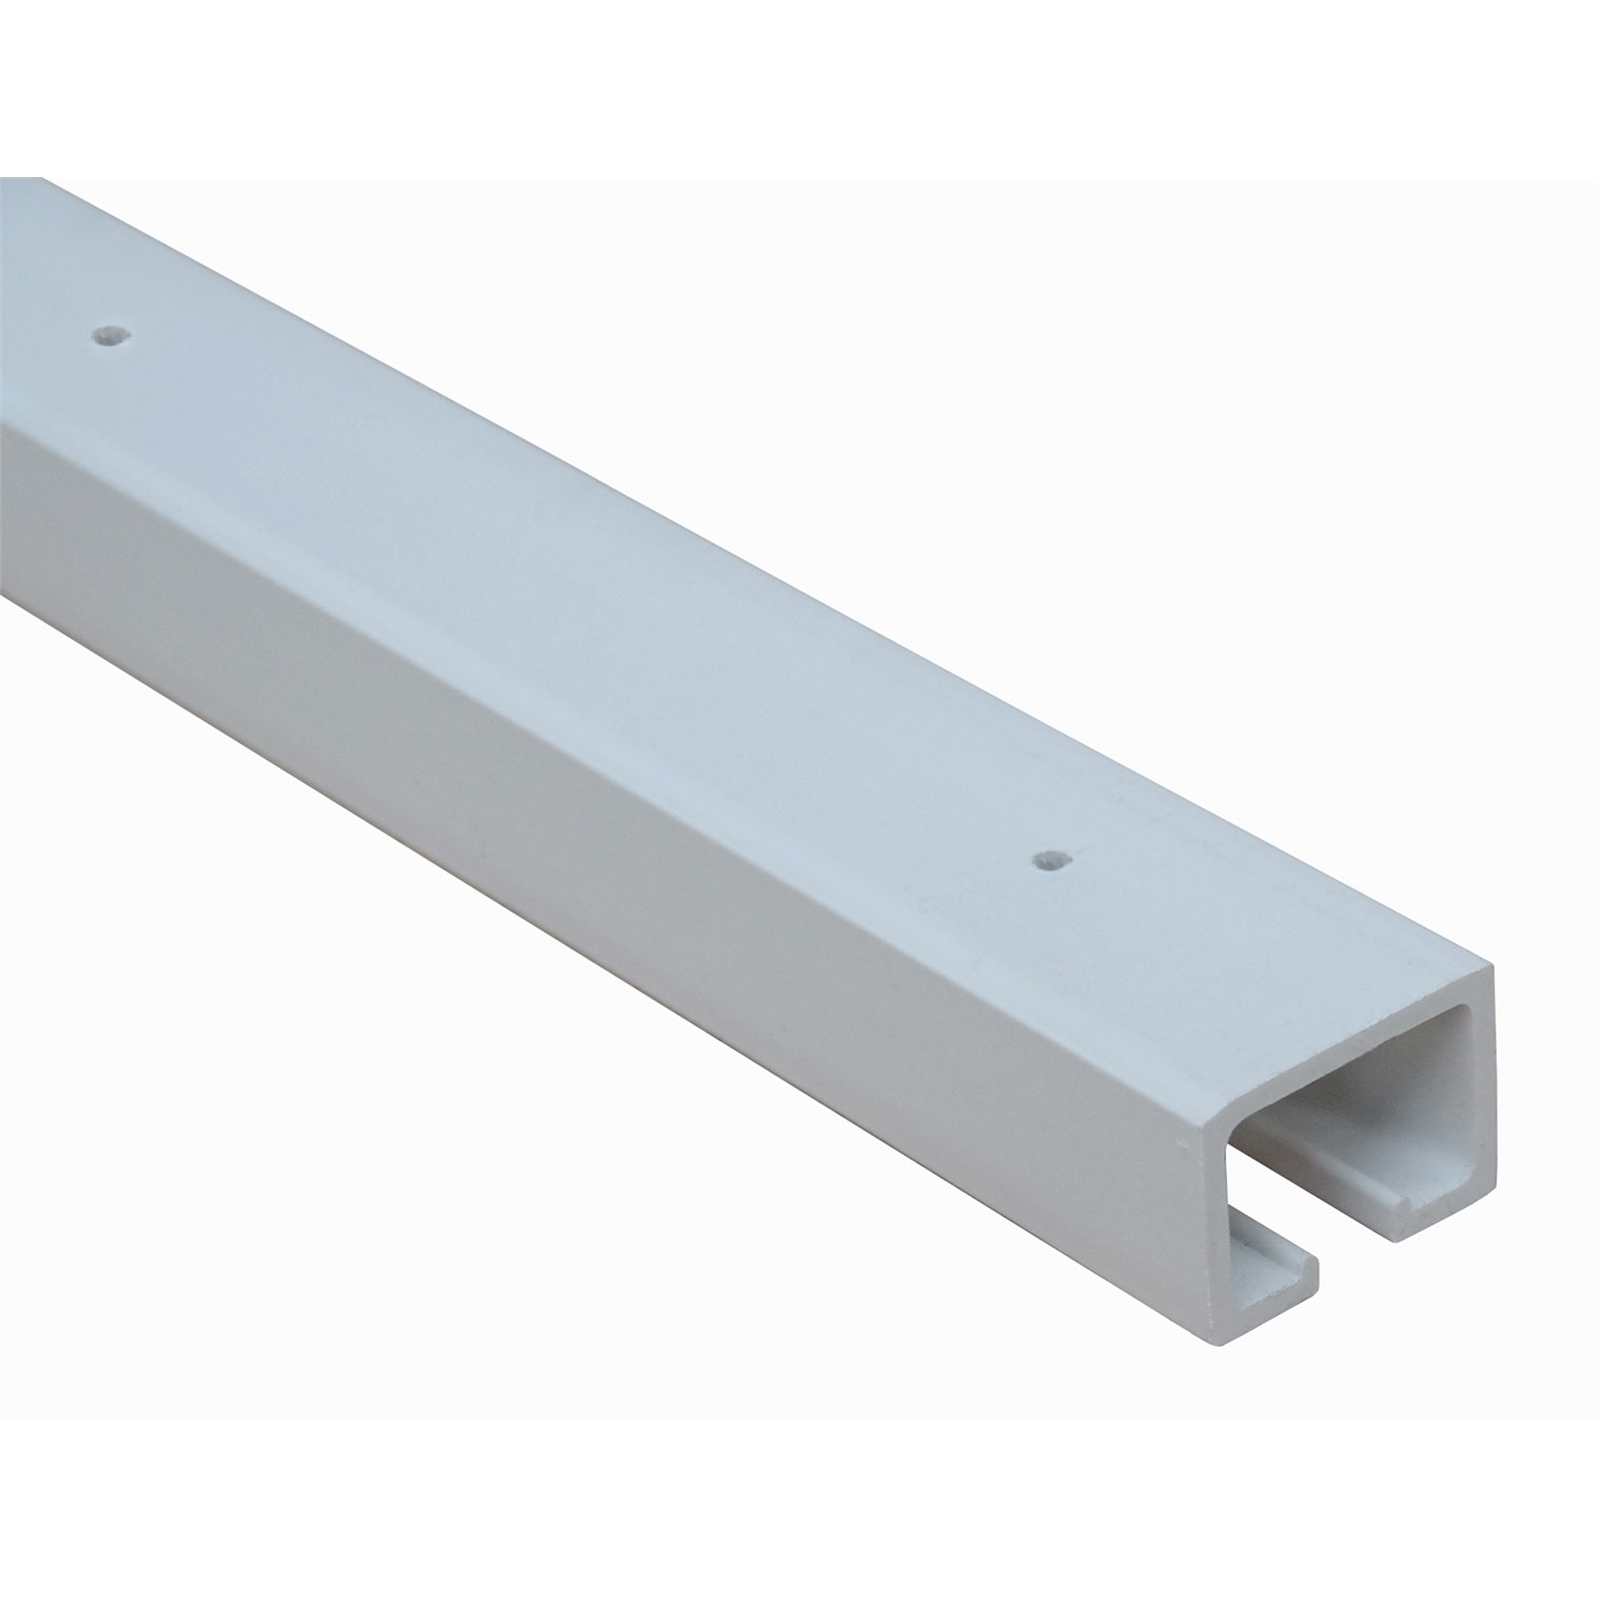 Pillar Products 2050mm San Marino White Oak Concertina Door Headrail Extension